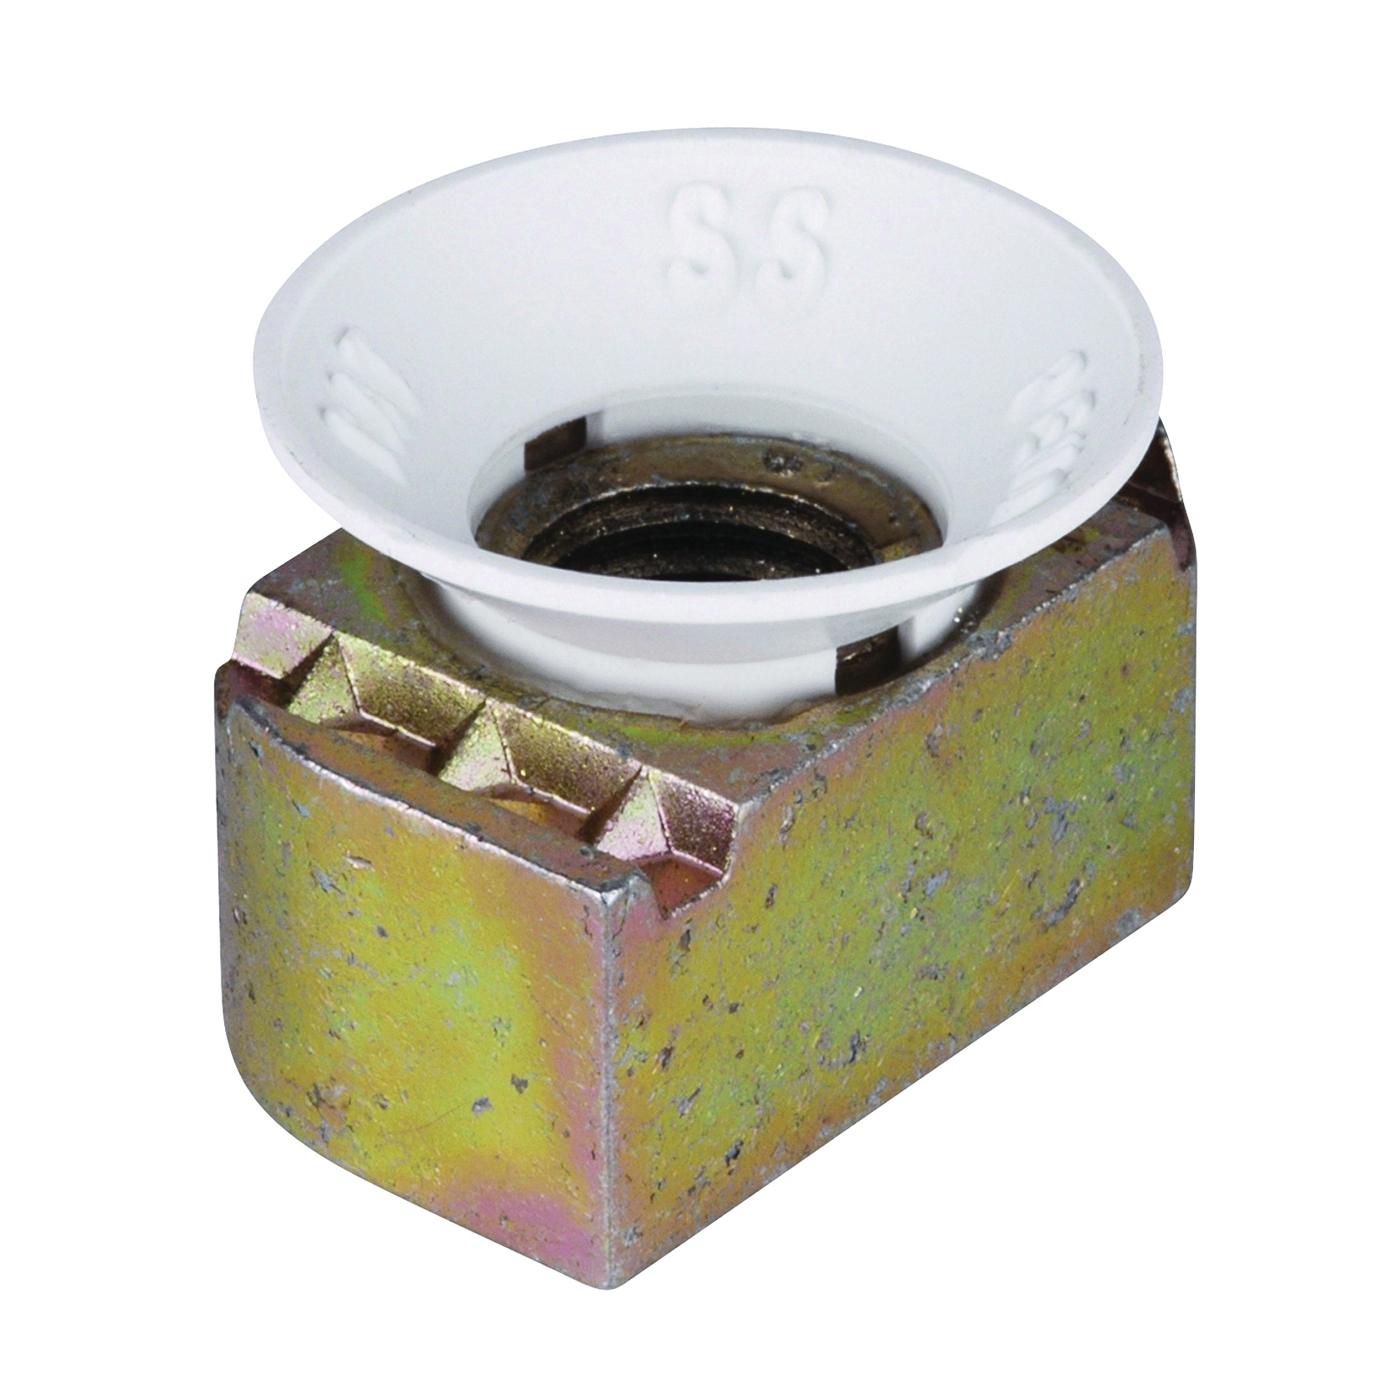 Picture of SuperStrut ZCM1001/2-10 Cone Nut, Nylon/Steel, Gold, Galvanized